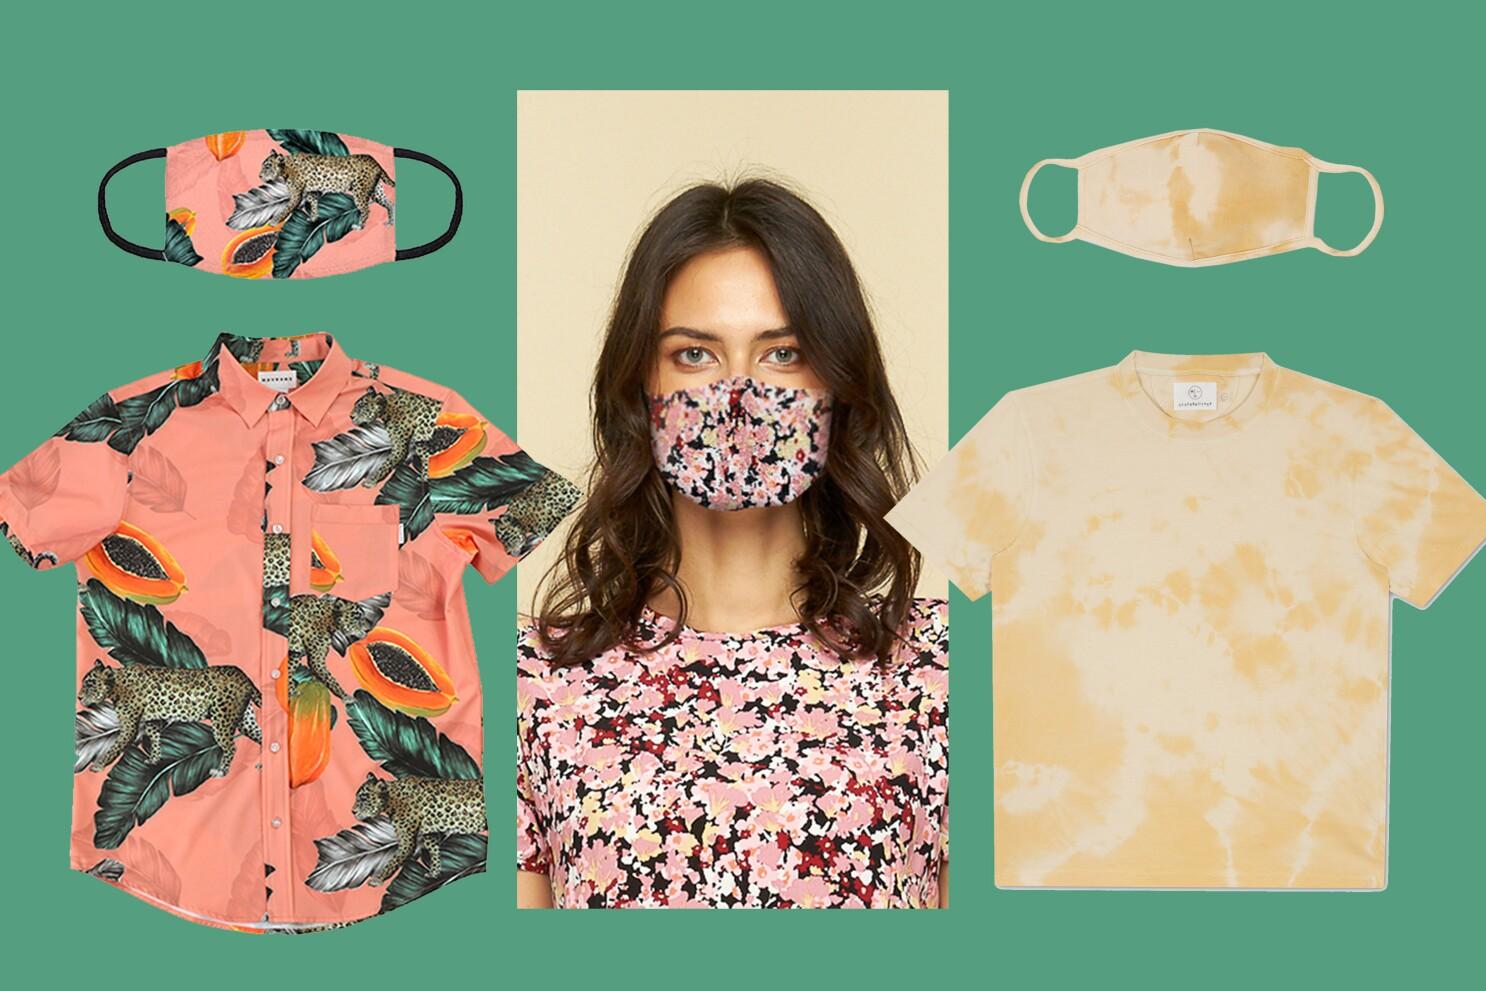 Coronavirus Tips Stylish Matching Sets With Face Masks Los Angeles Times